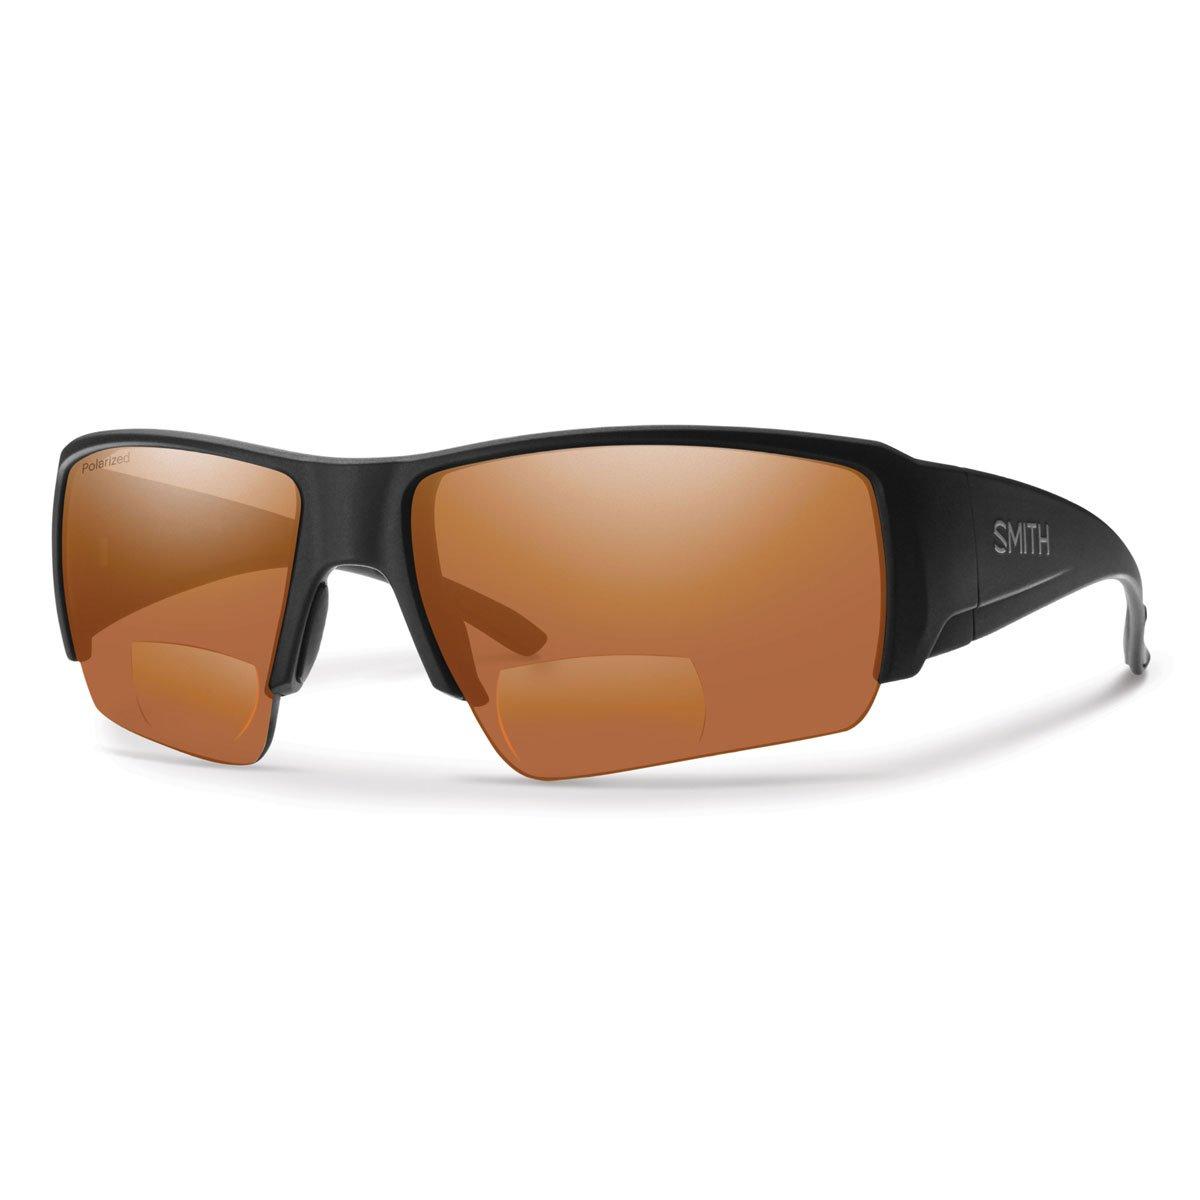 380ebe6abd Smith Optics Captains Choice Bifocal Polarized Sunglasses